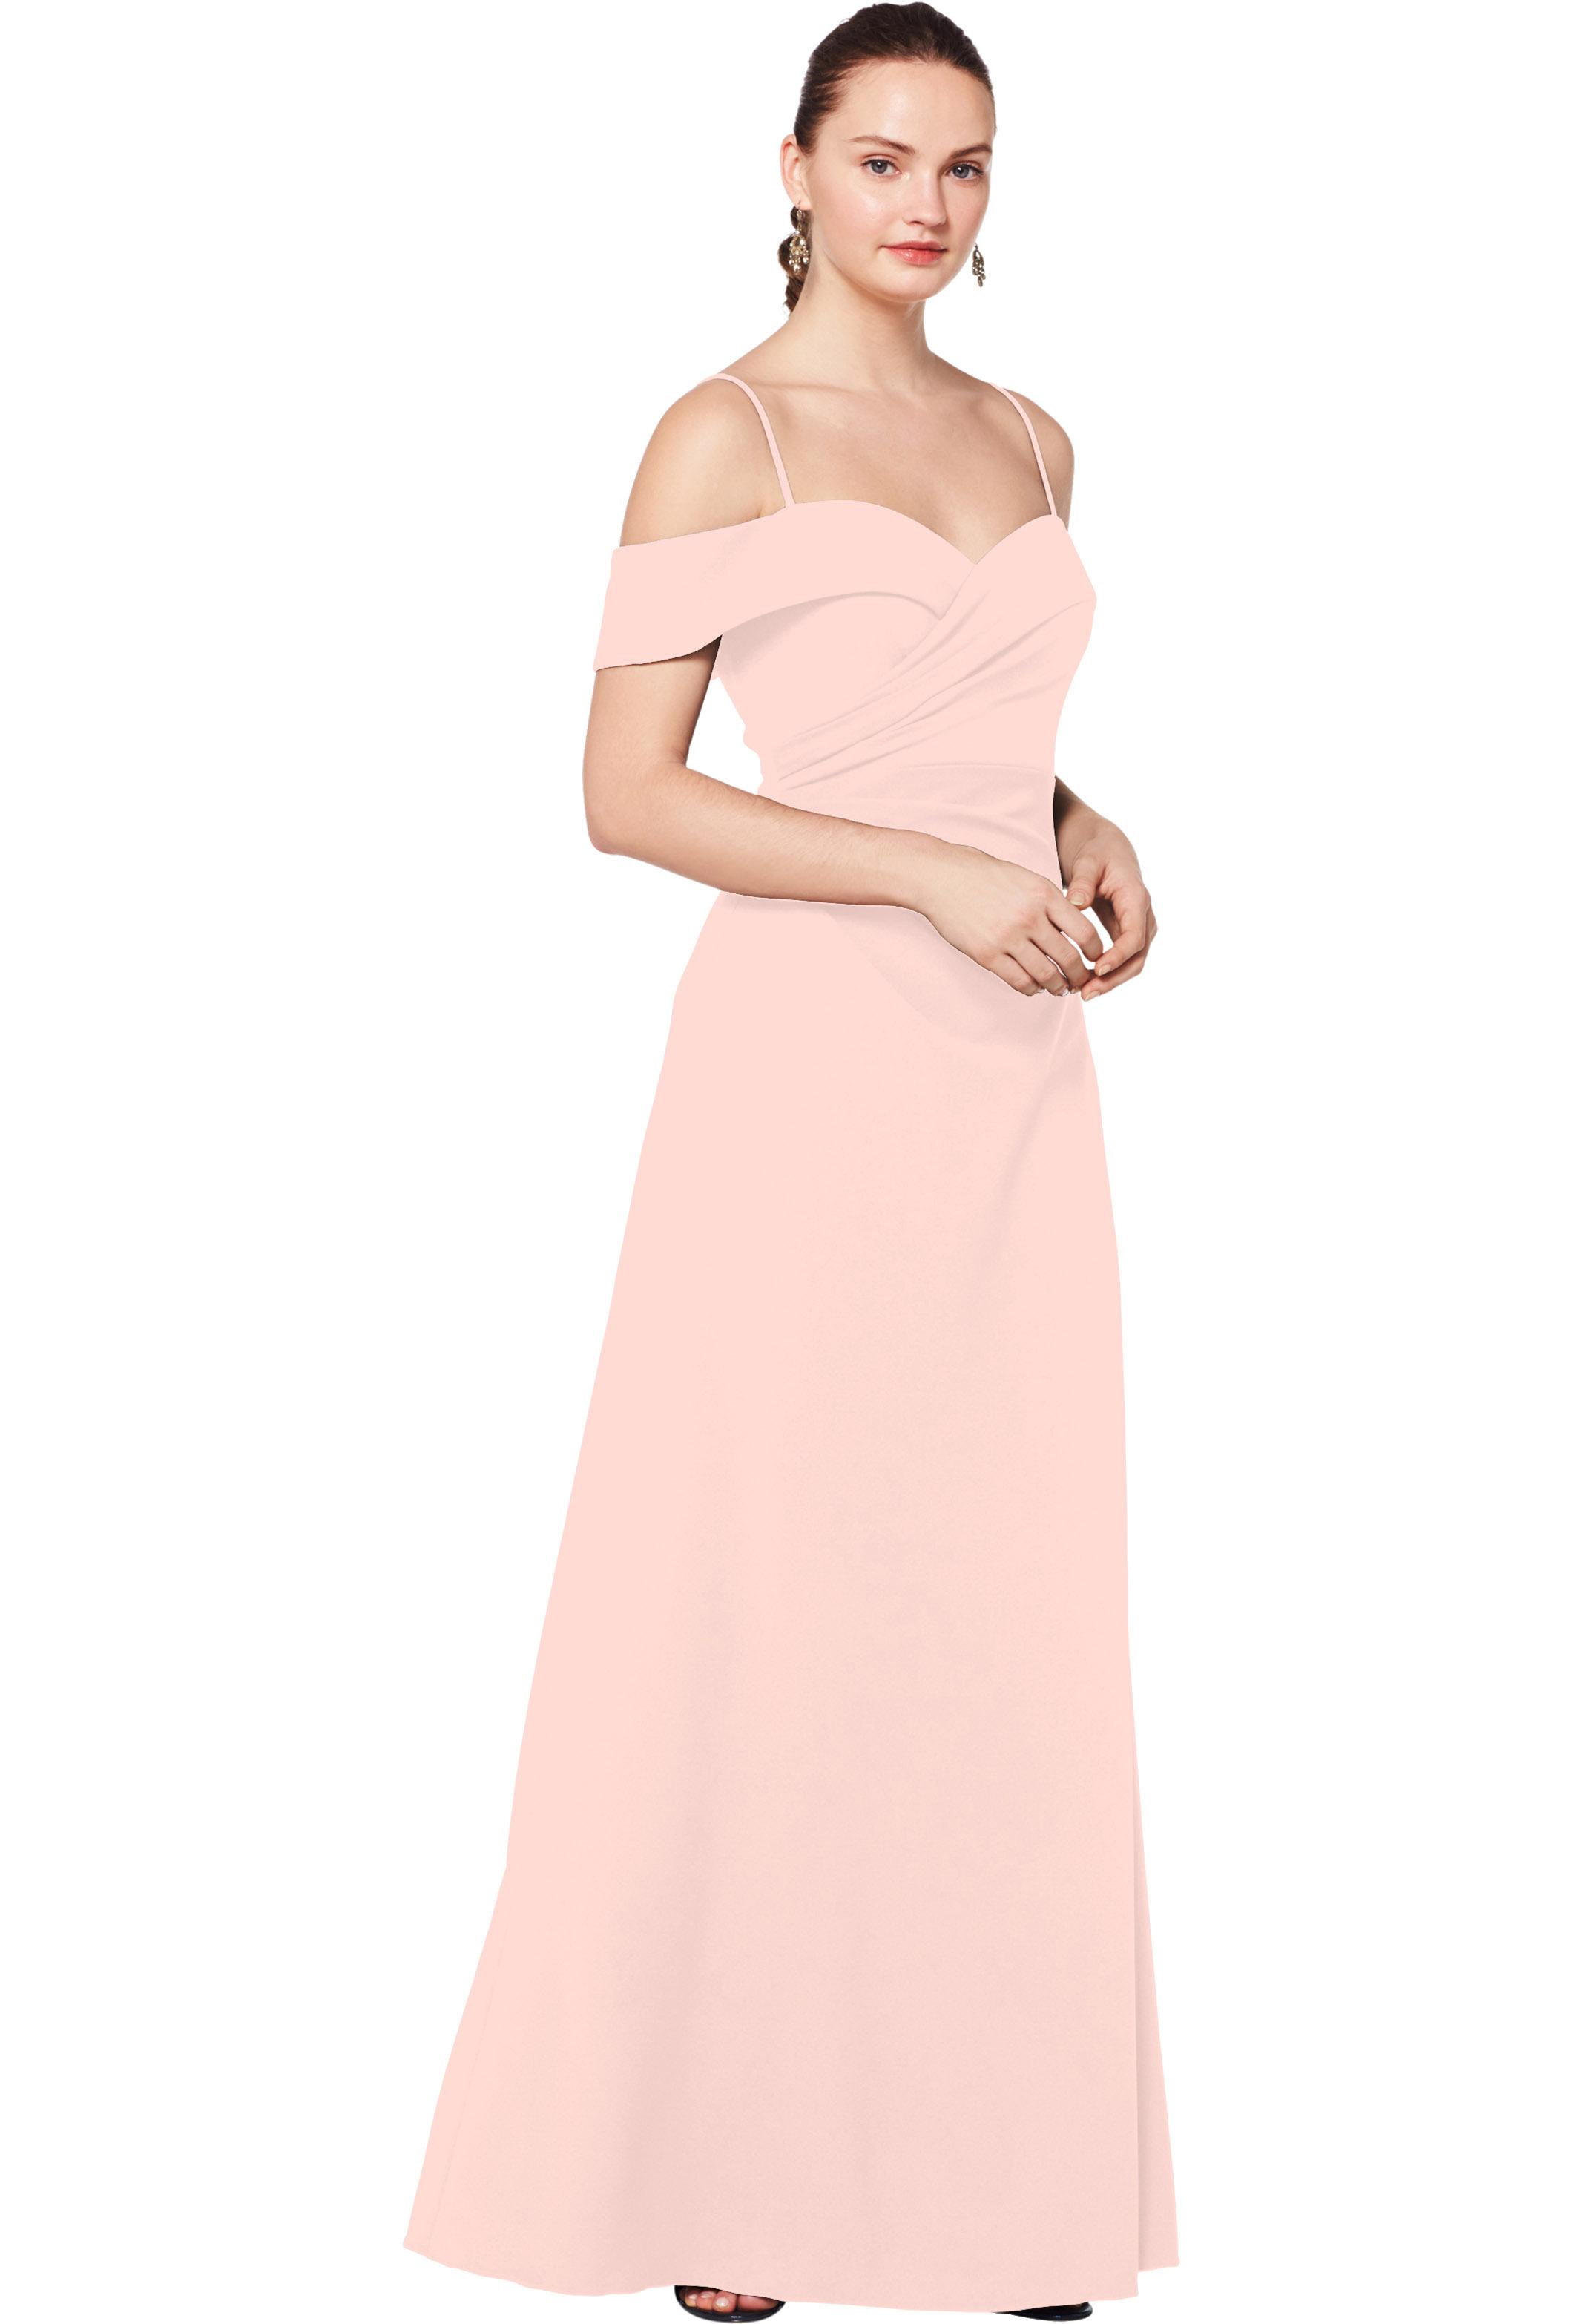 Bill Levkoff BALLET Stretch Crepe Off The Shoulder A-line gown, $230.00 Front